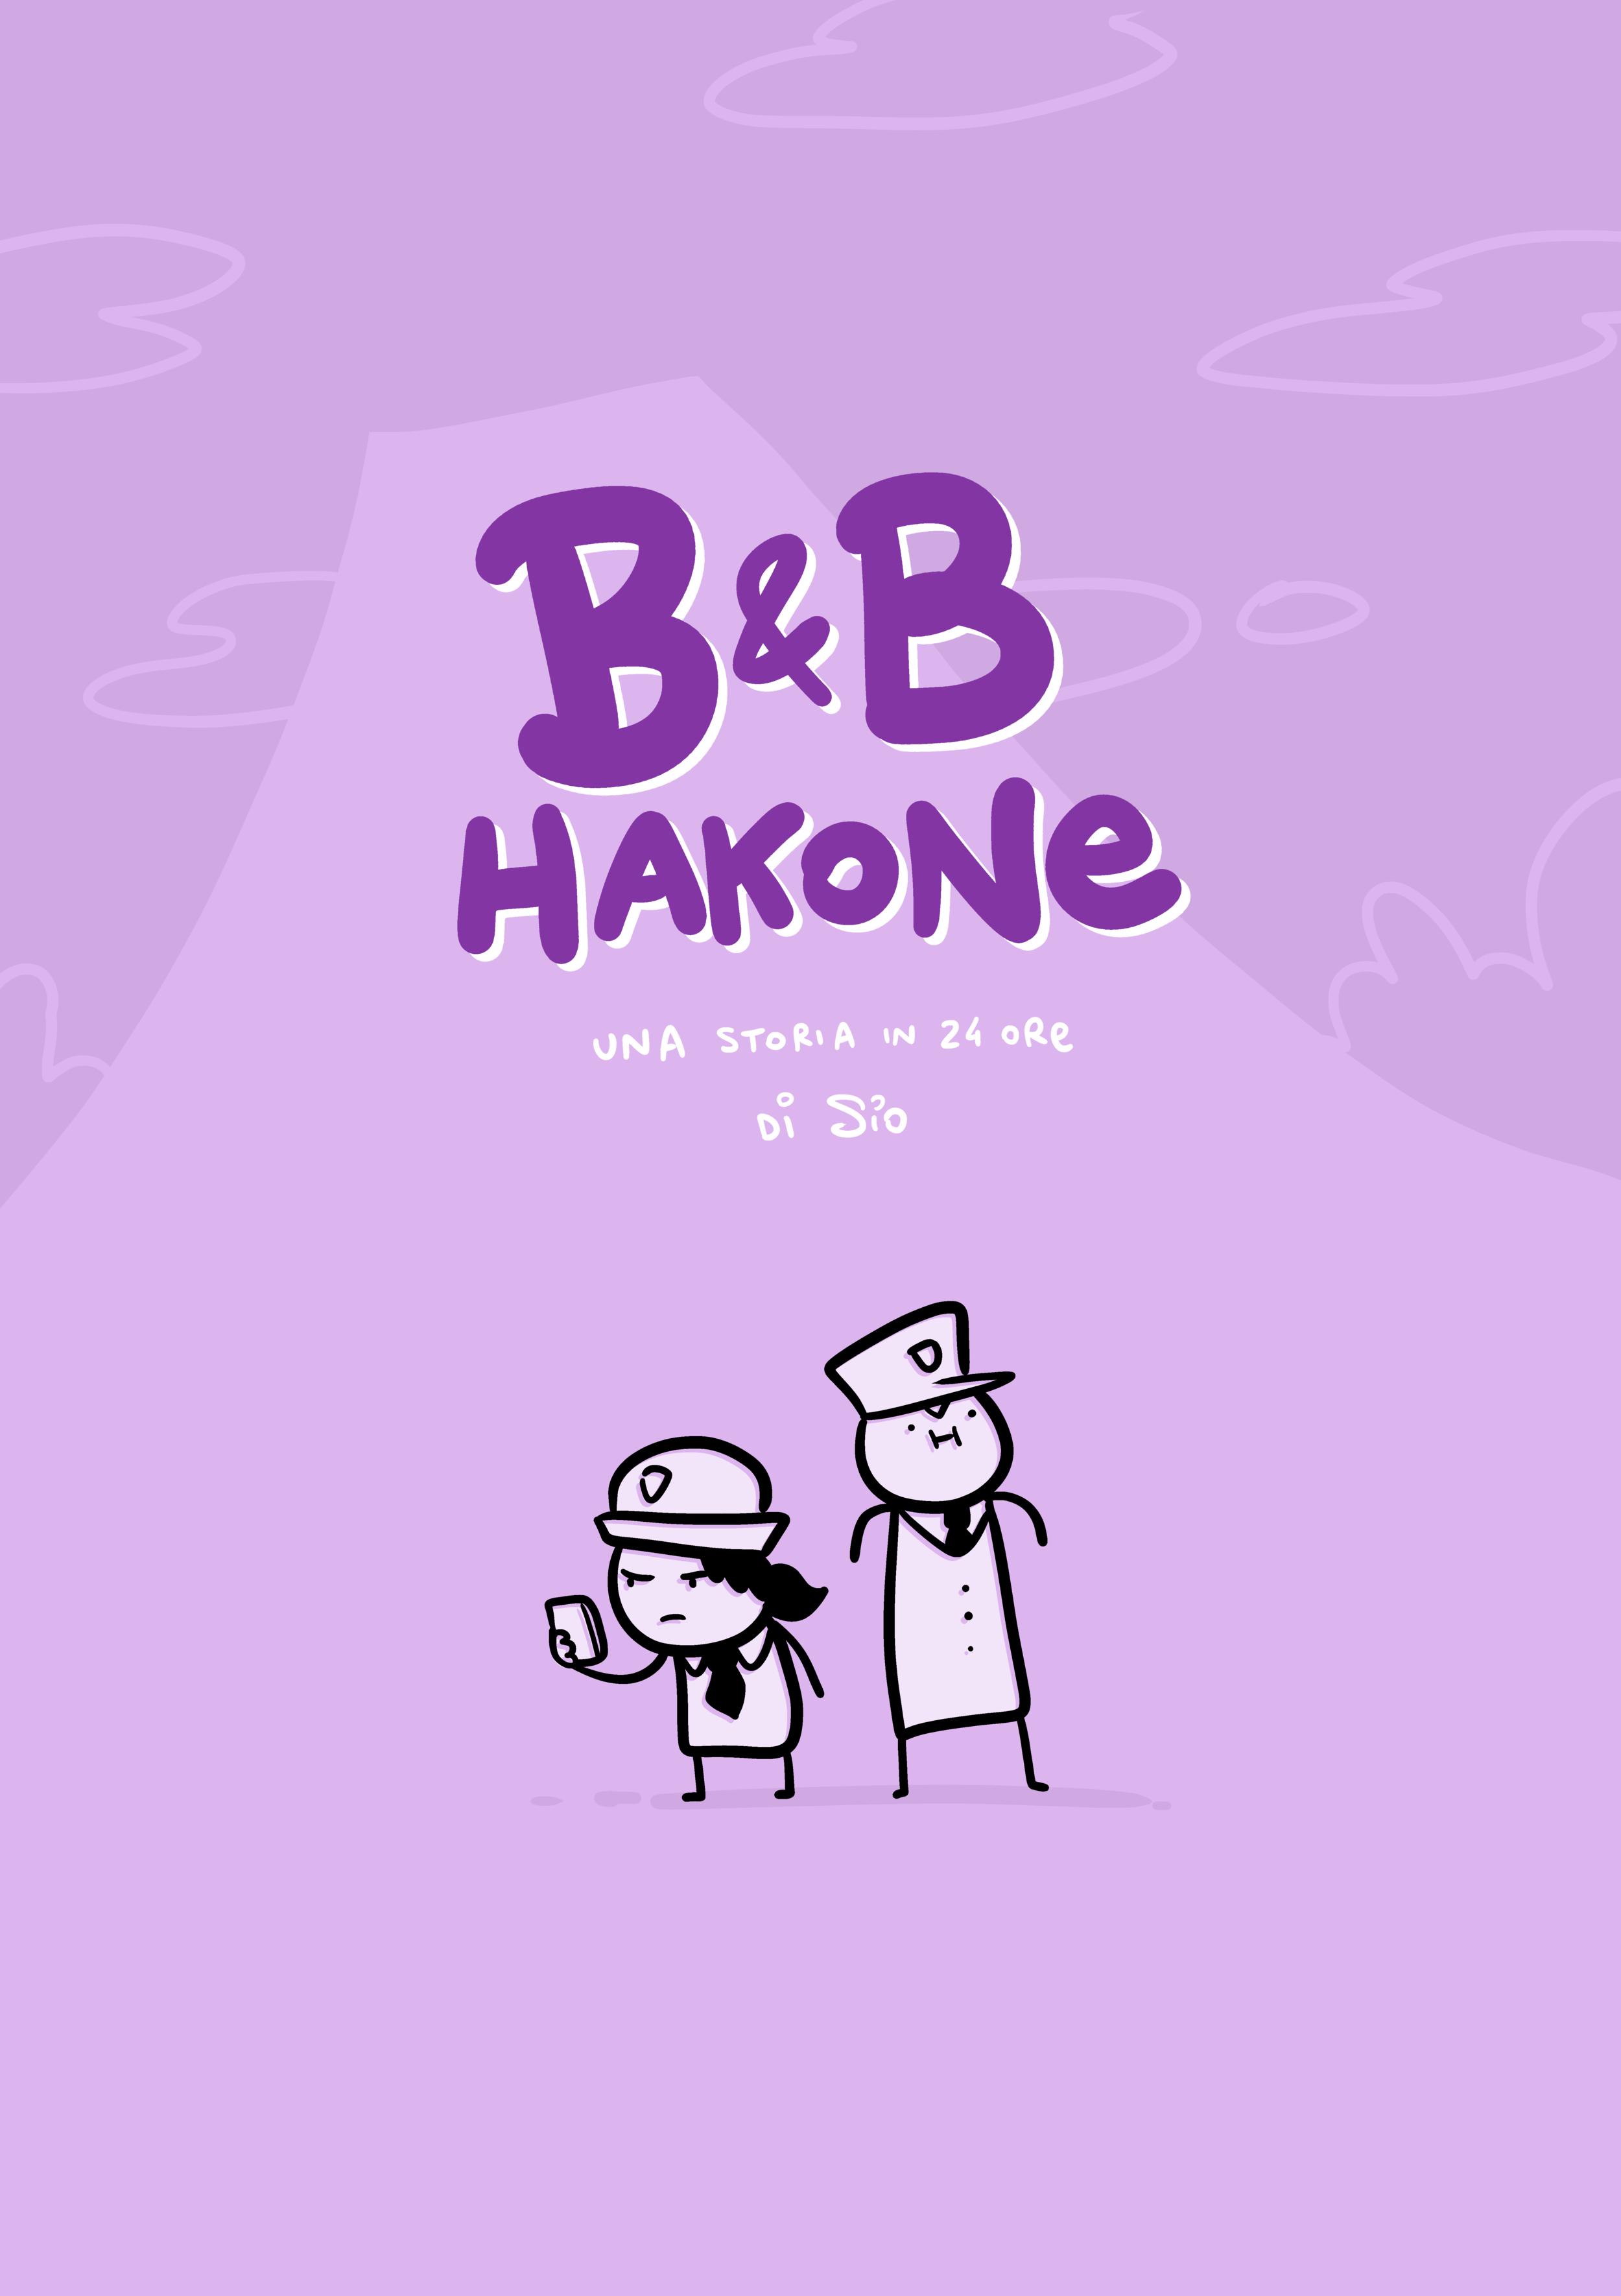 BnB Hakone_001.png